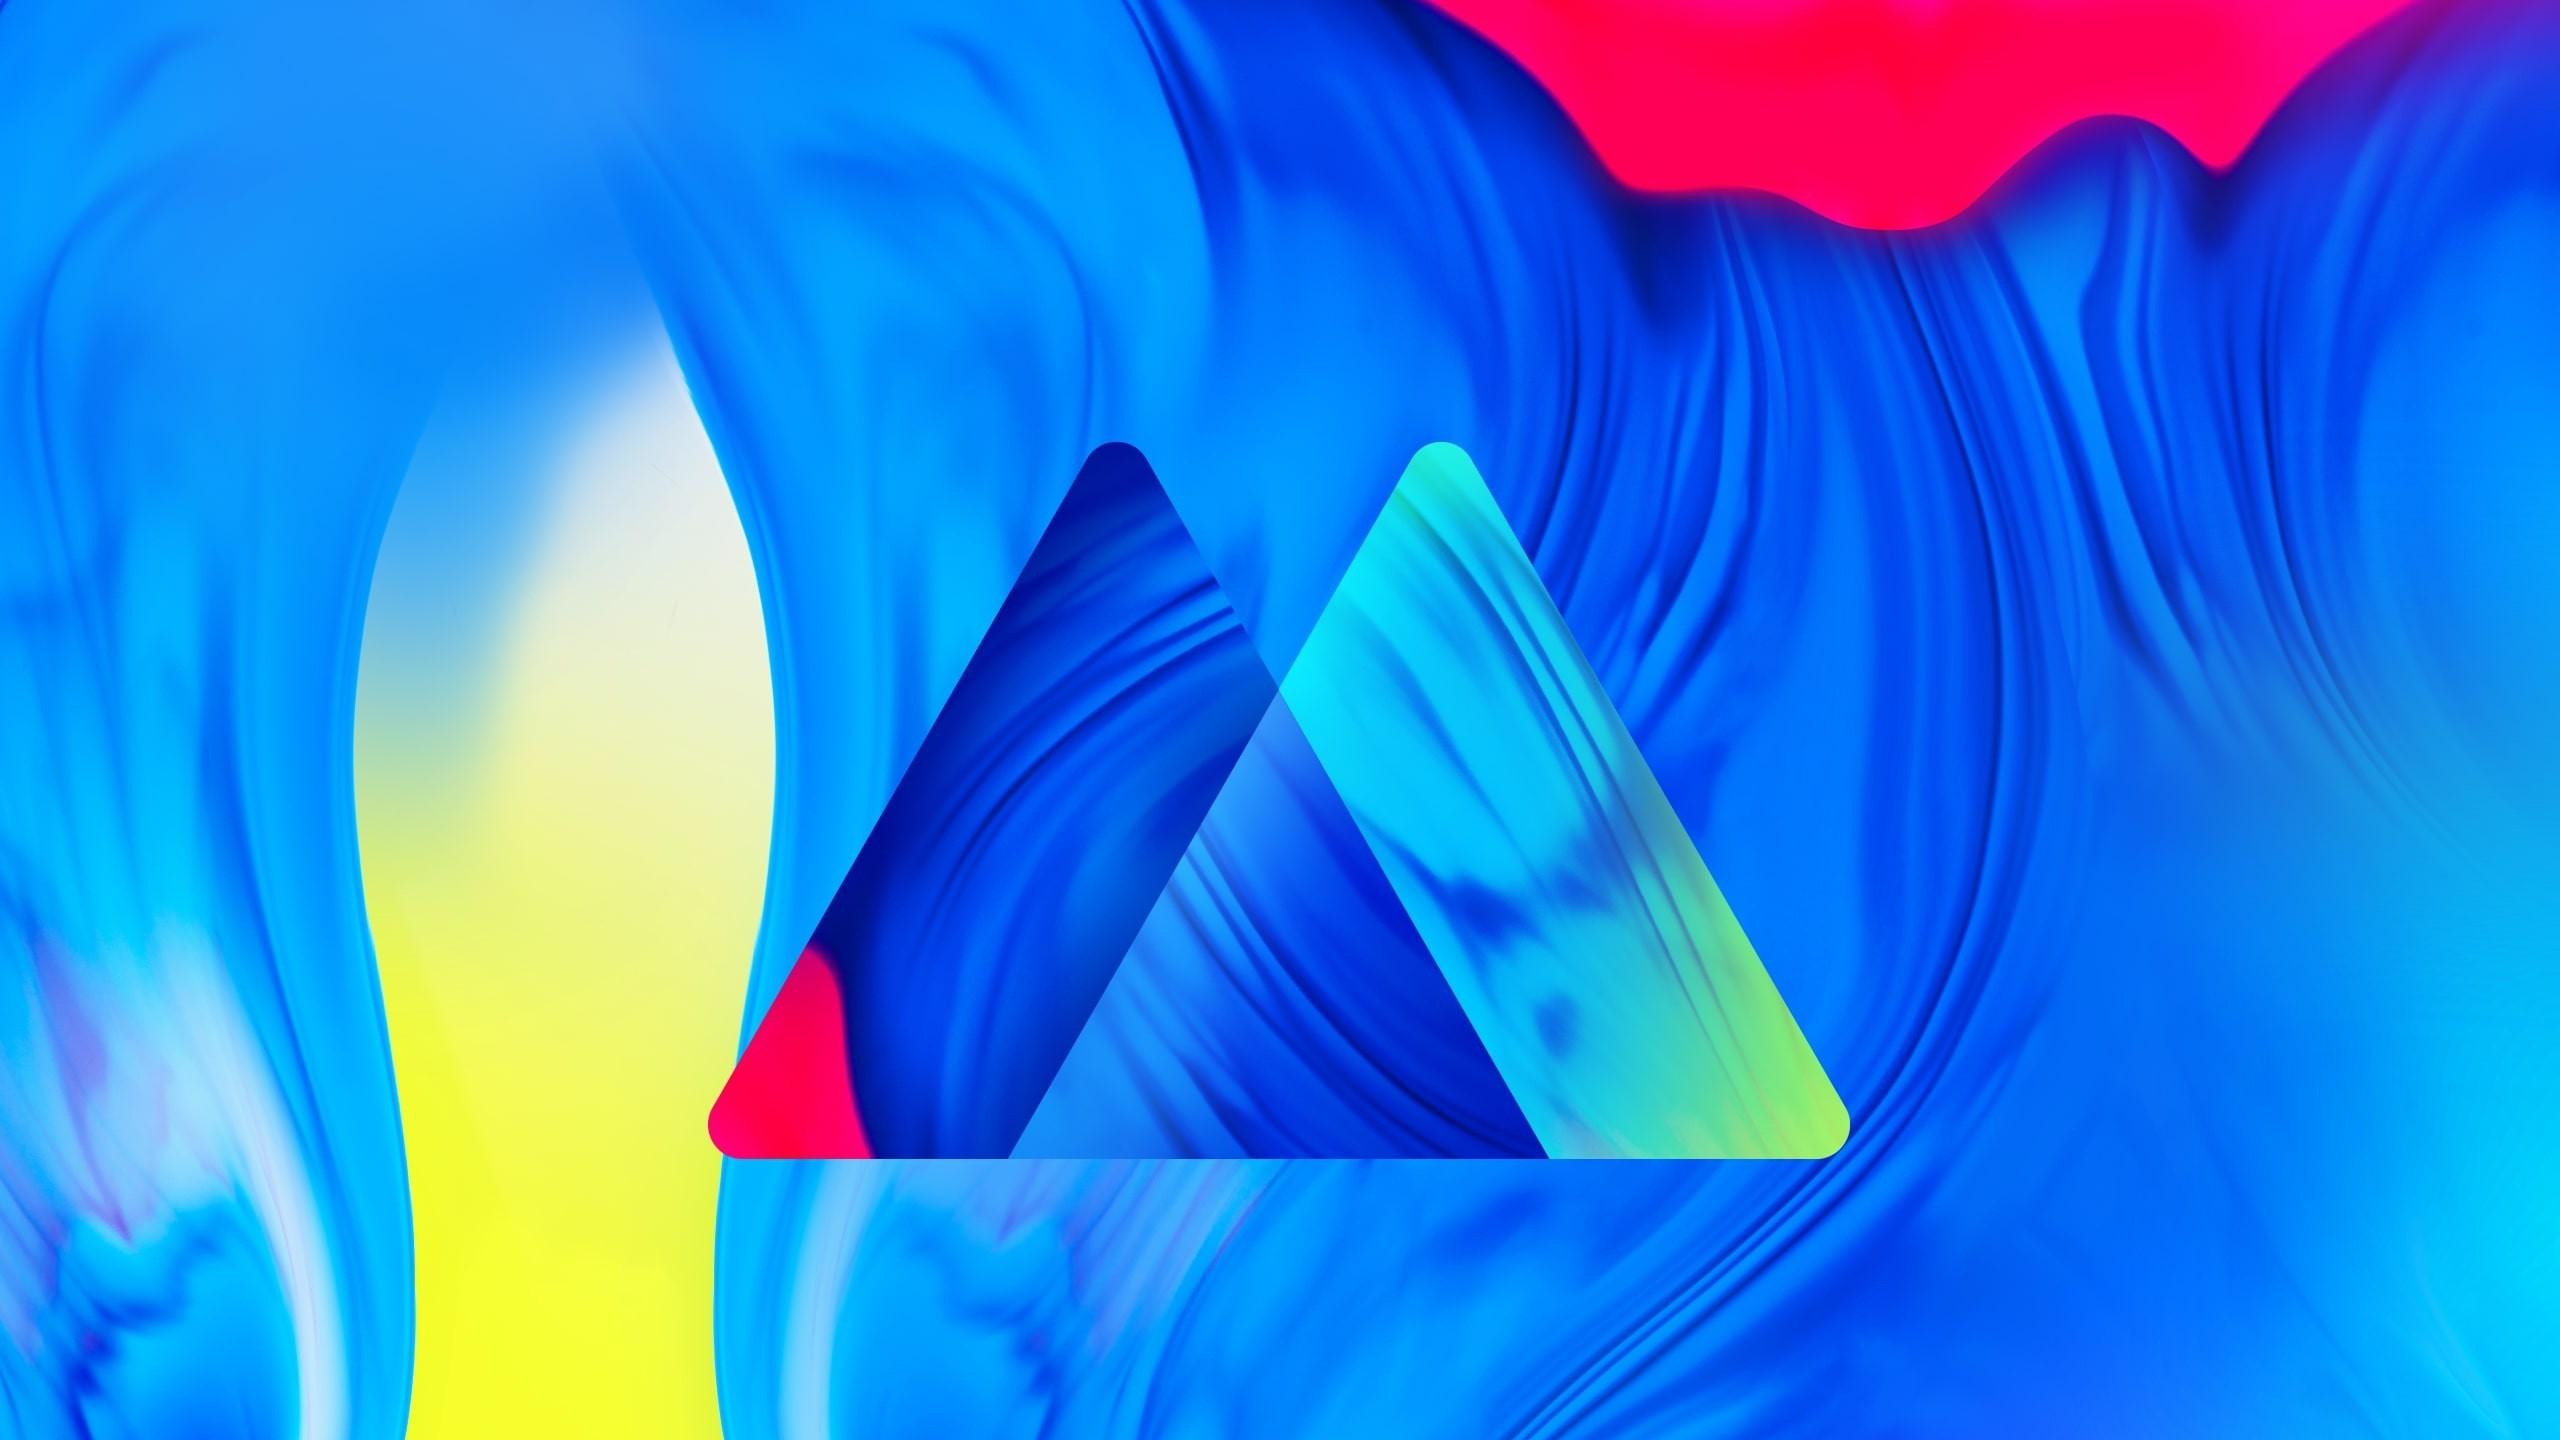 Wallpaper Samsung Galaxy M10 abstract colorful HD OS 21445 2560x1440